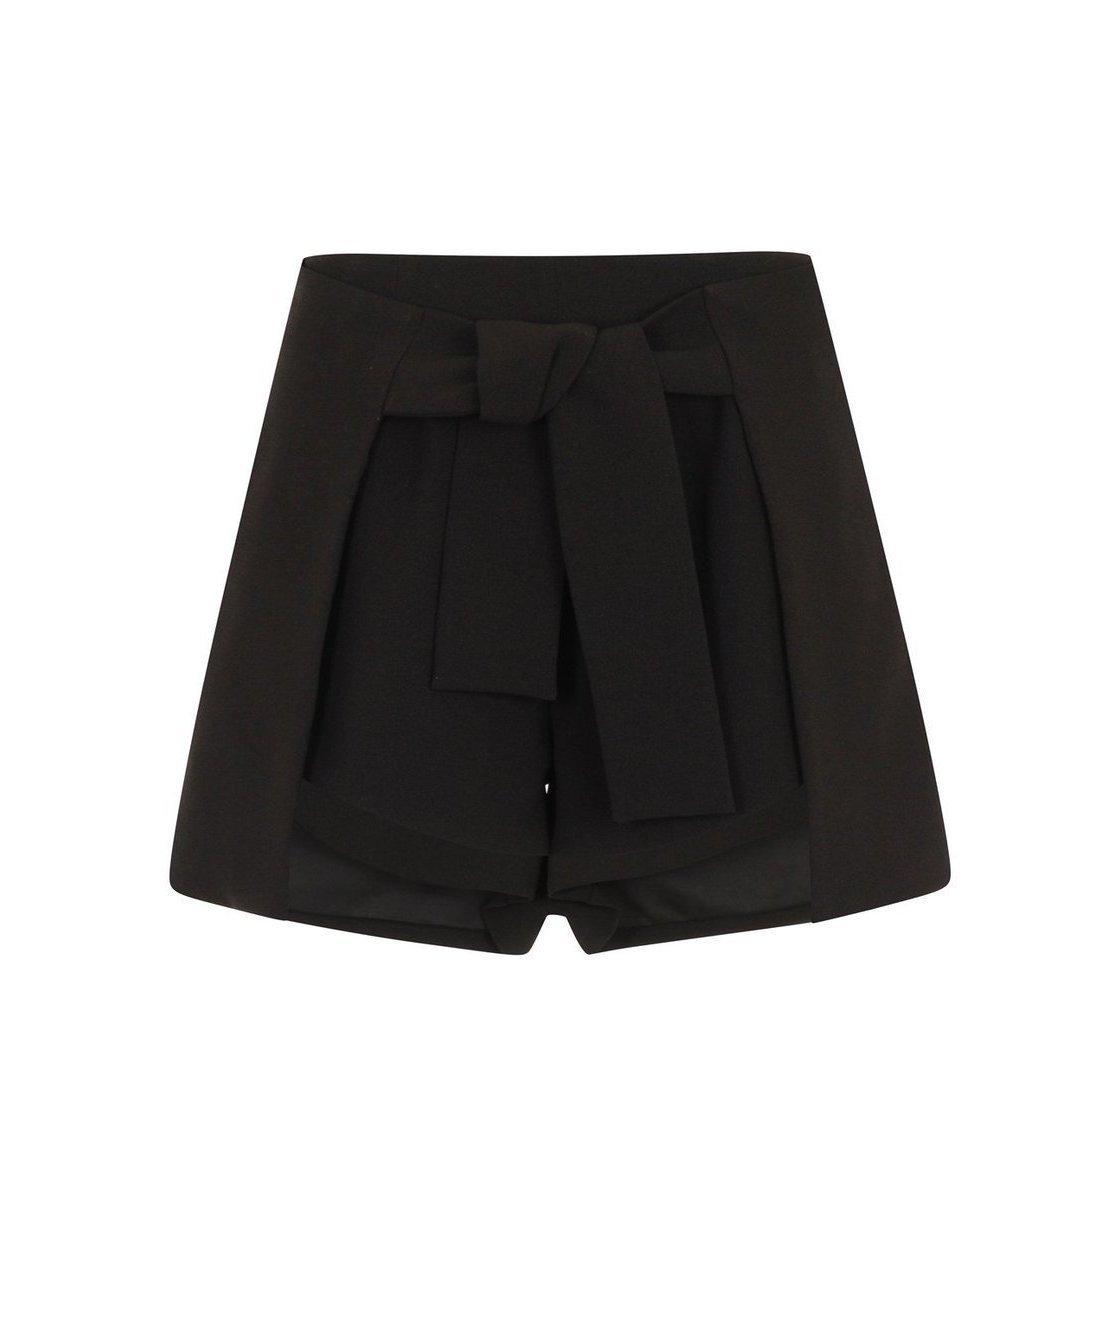 ab06320482172 Lavish Alice Black Tie Front Side Split Shorts - as seen on Taylor Swift